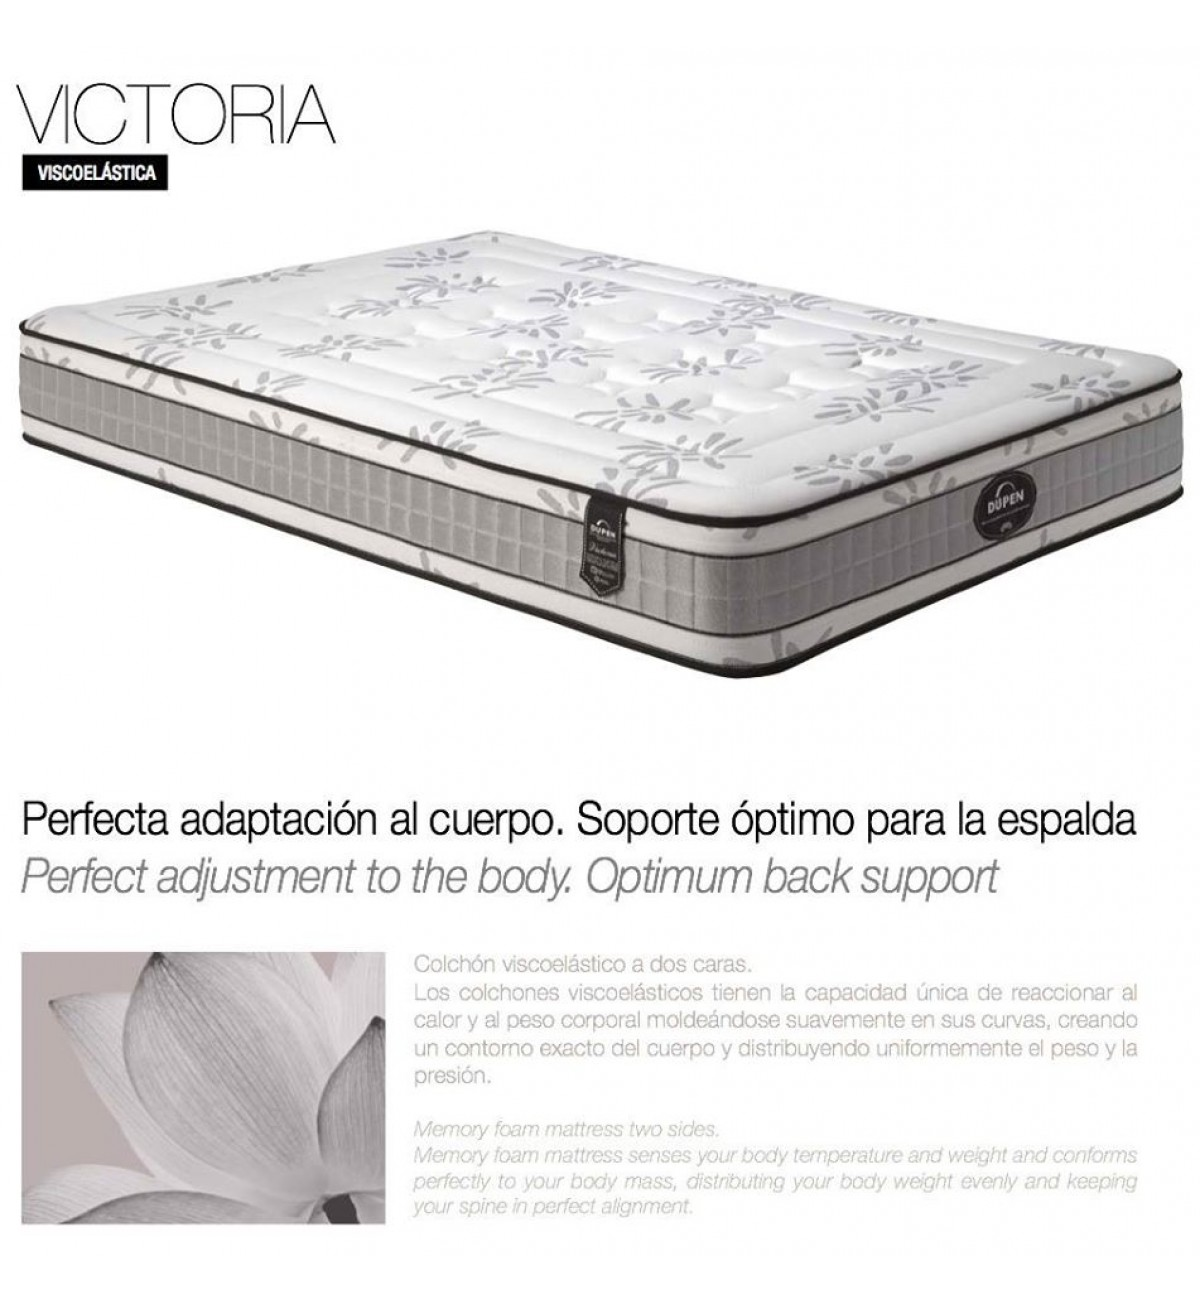 Colchón viscoelástico reversible VICTORIA de Dupen. Colchones online.